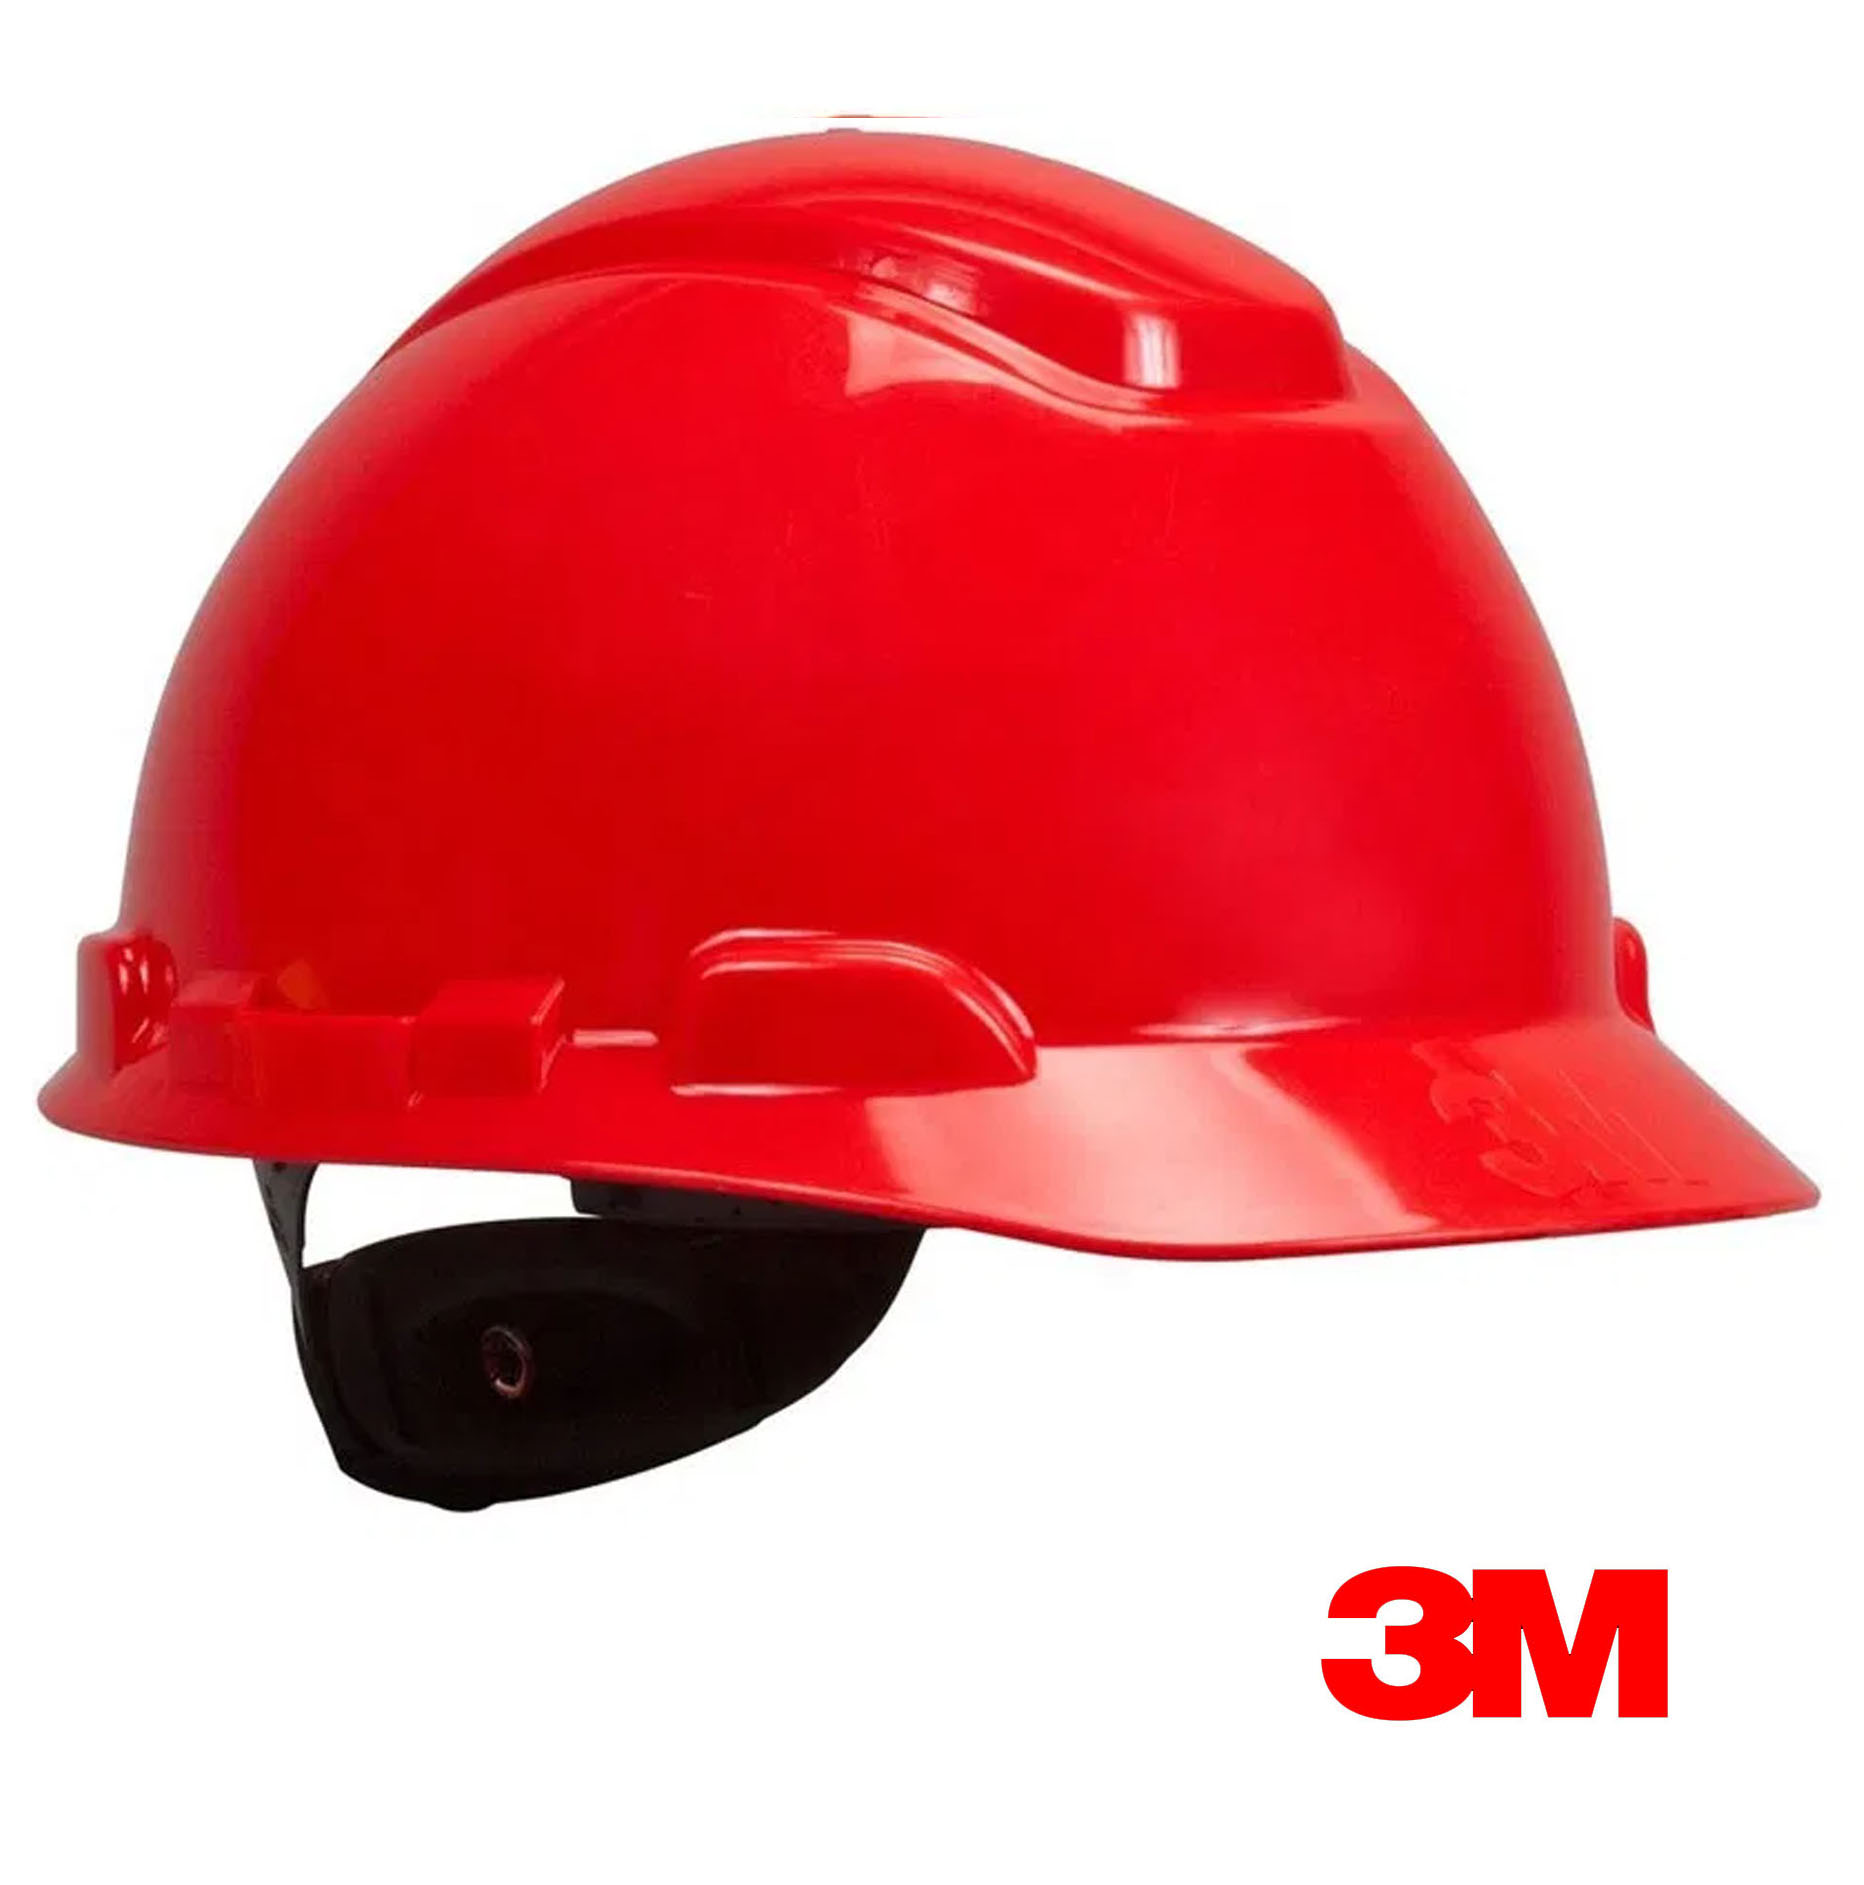 Casco de seguridad 3M Rojo Con Rachet